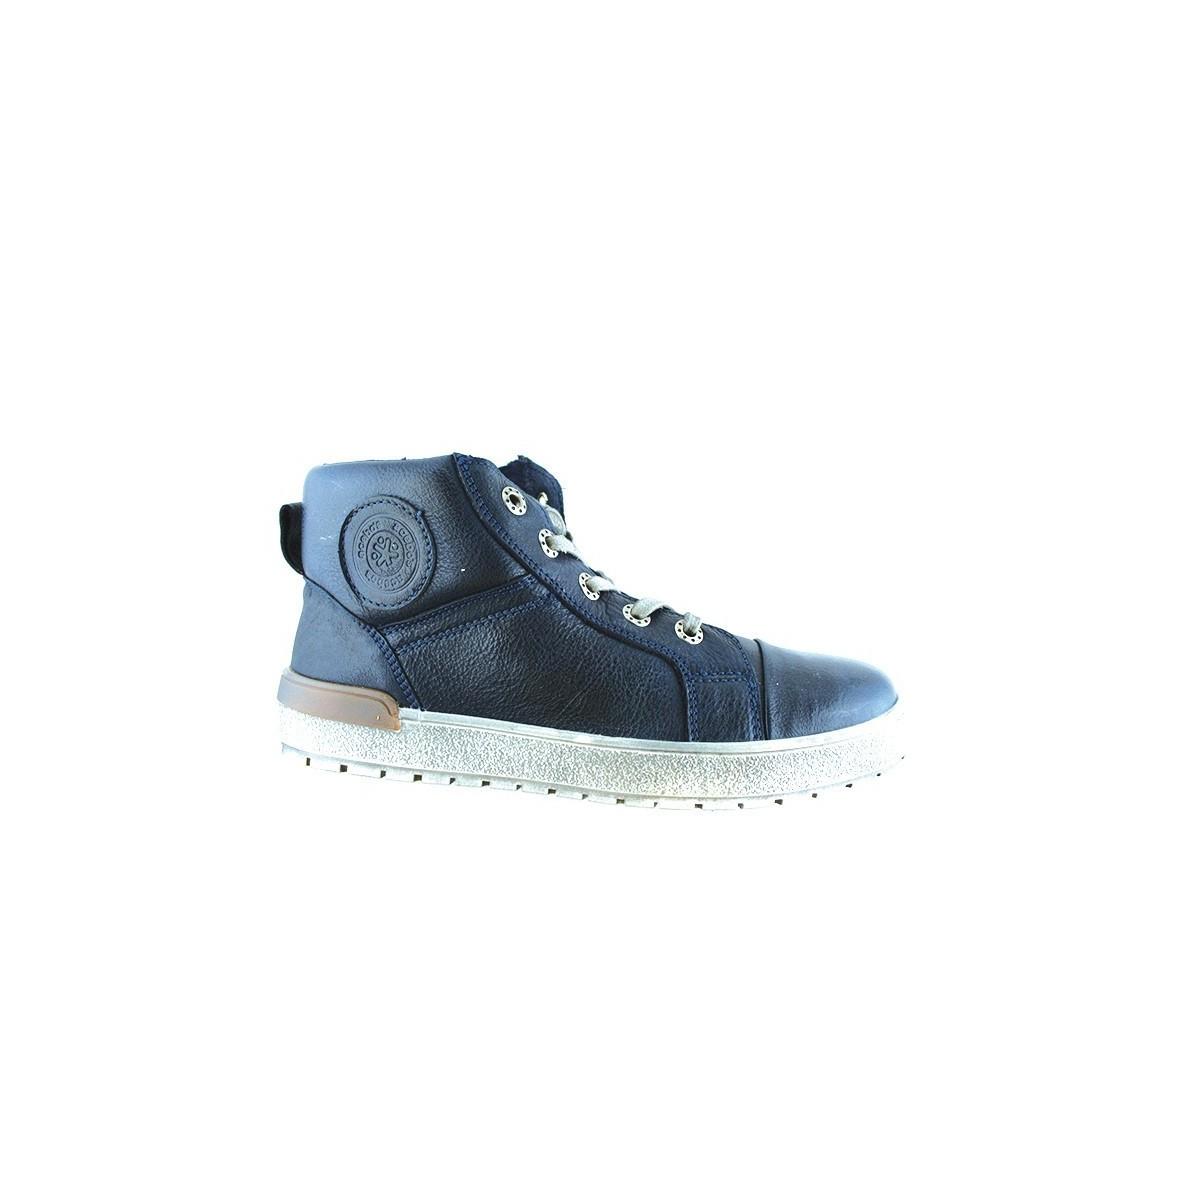 Chaussure montante lacet cuir marine